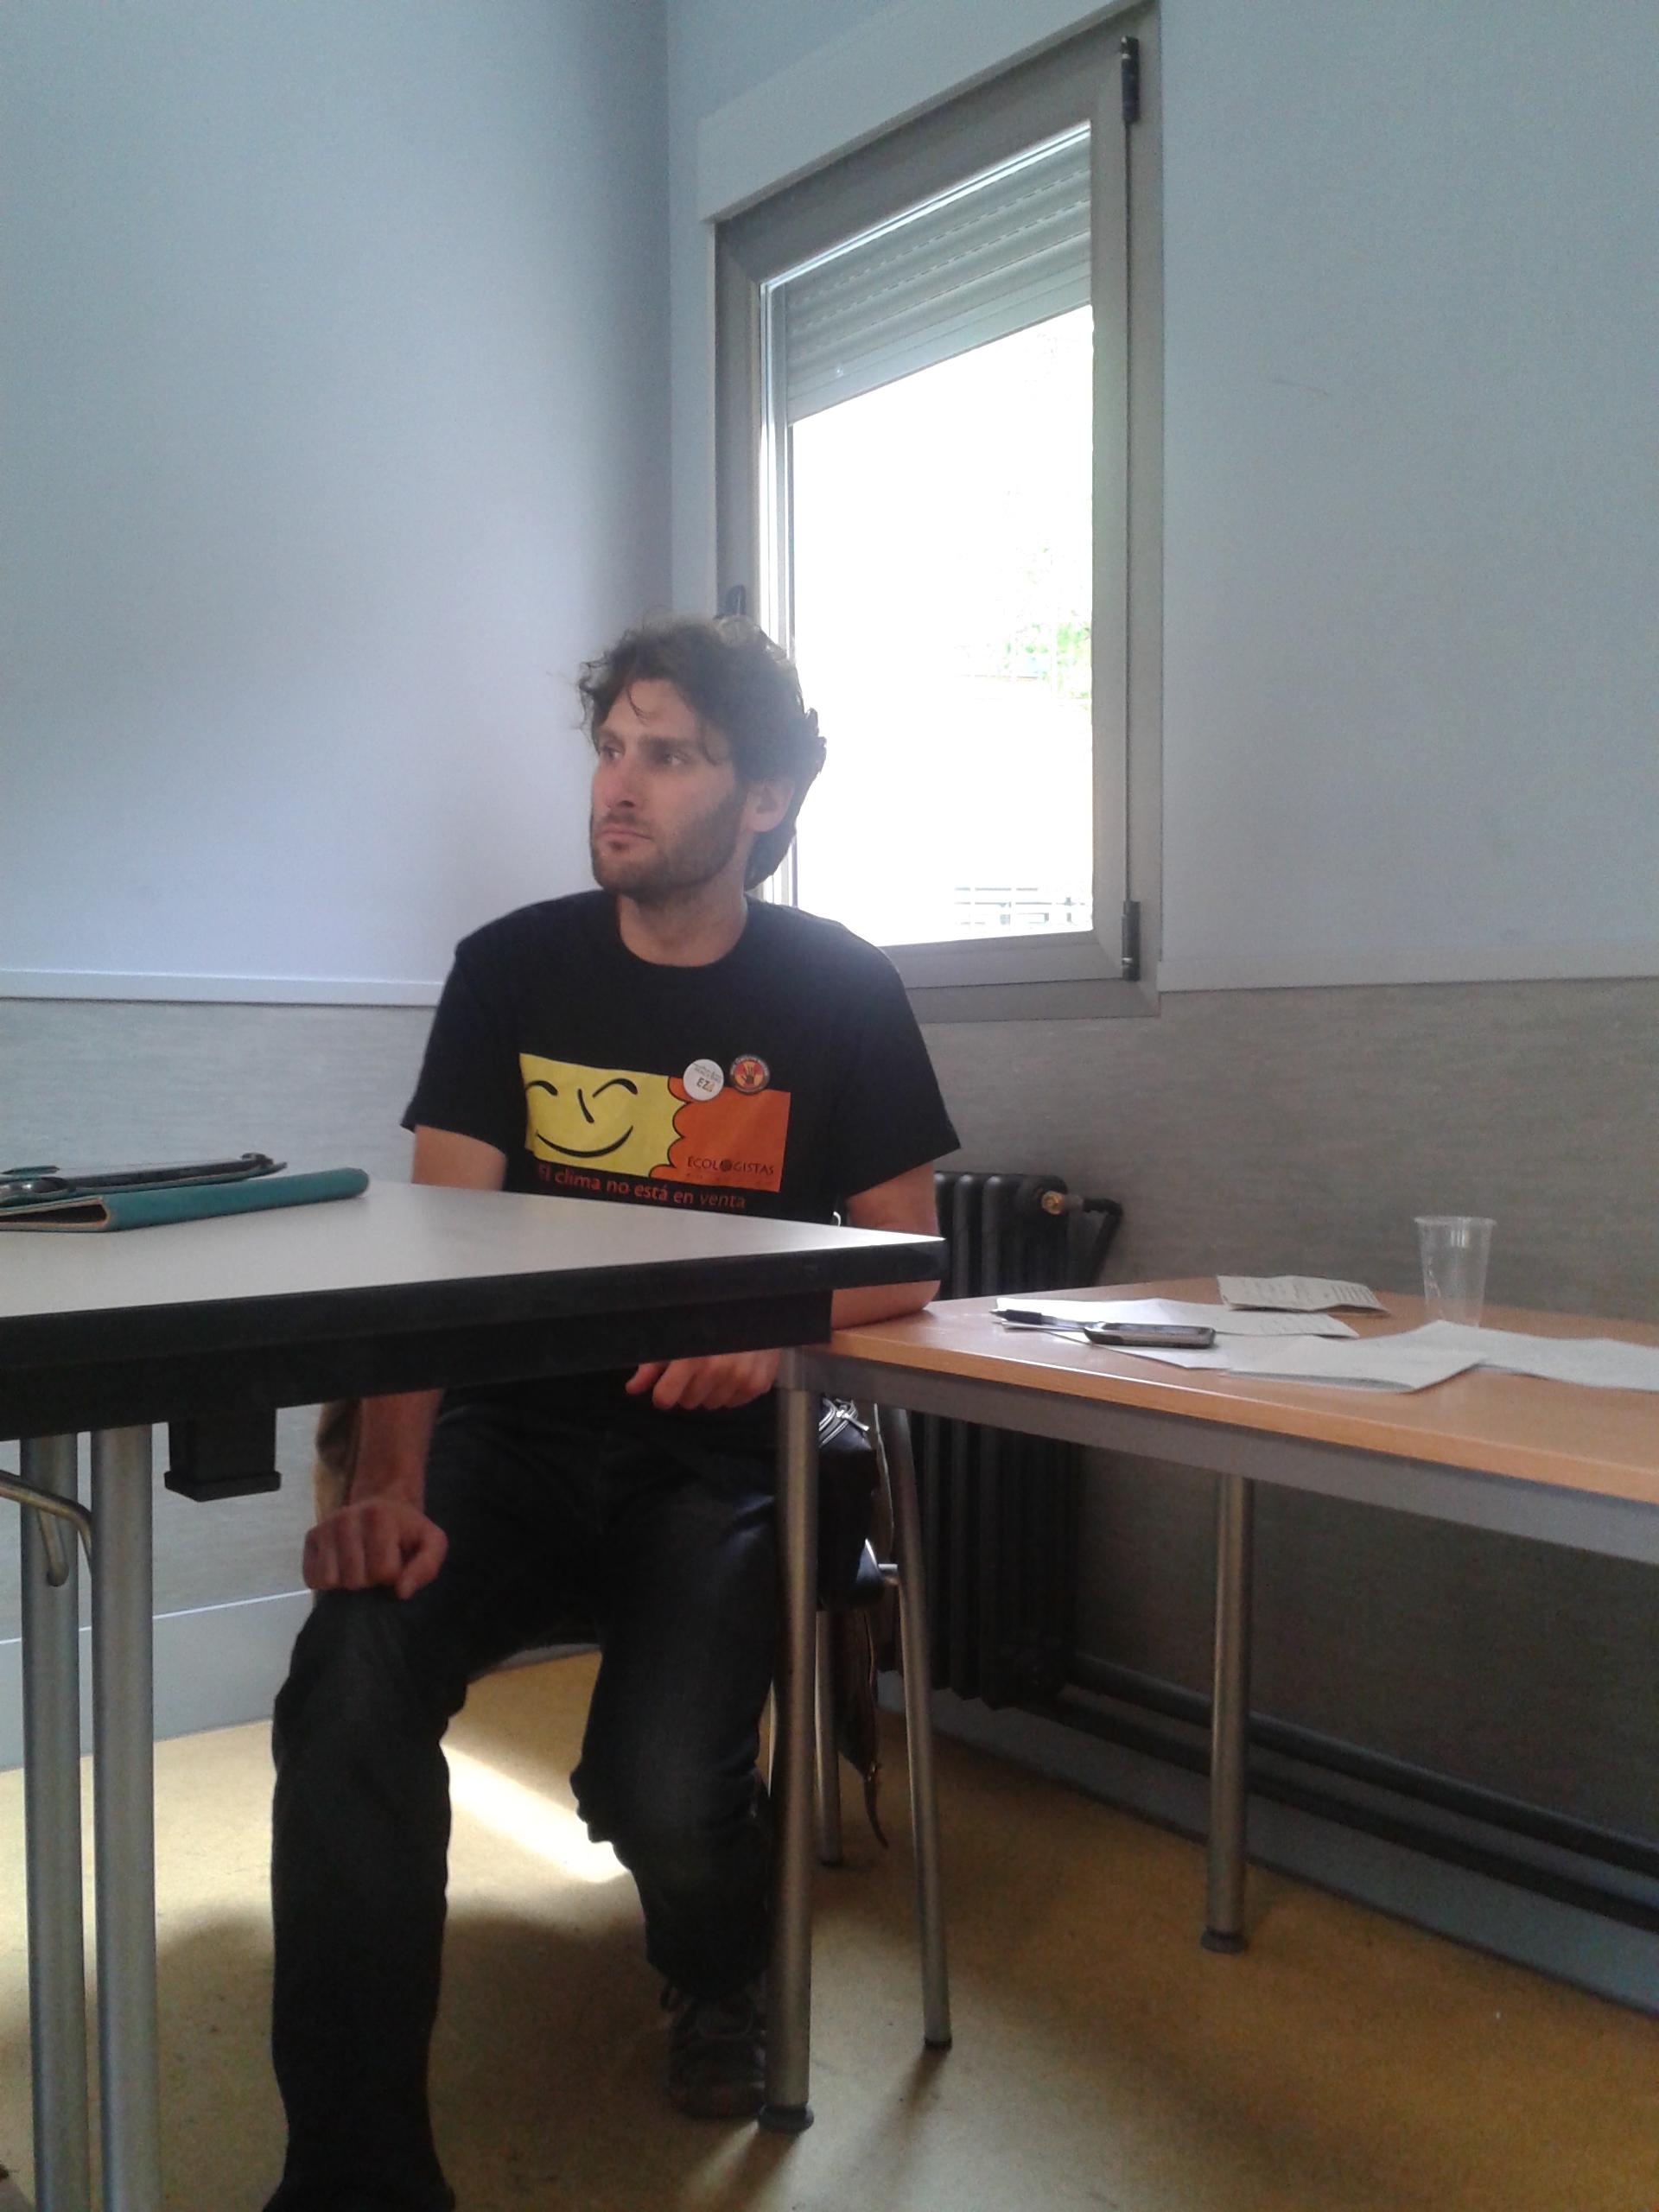 Rodrigo Irurzun, Área de Energía de Ecologistas en Acción